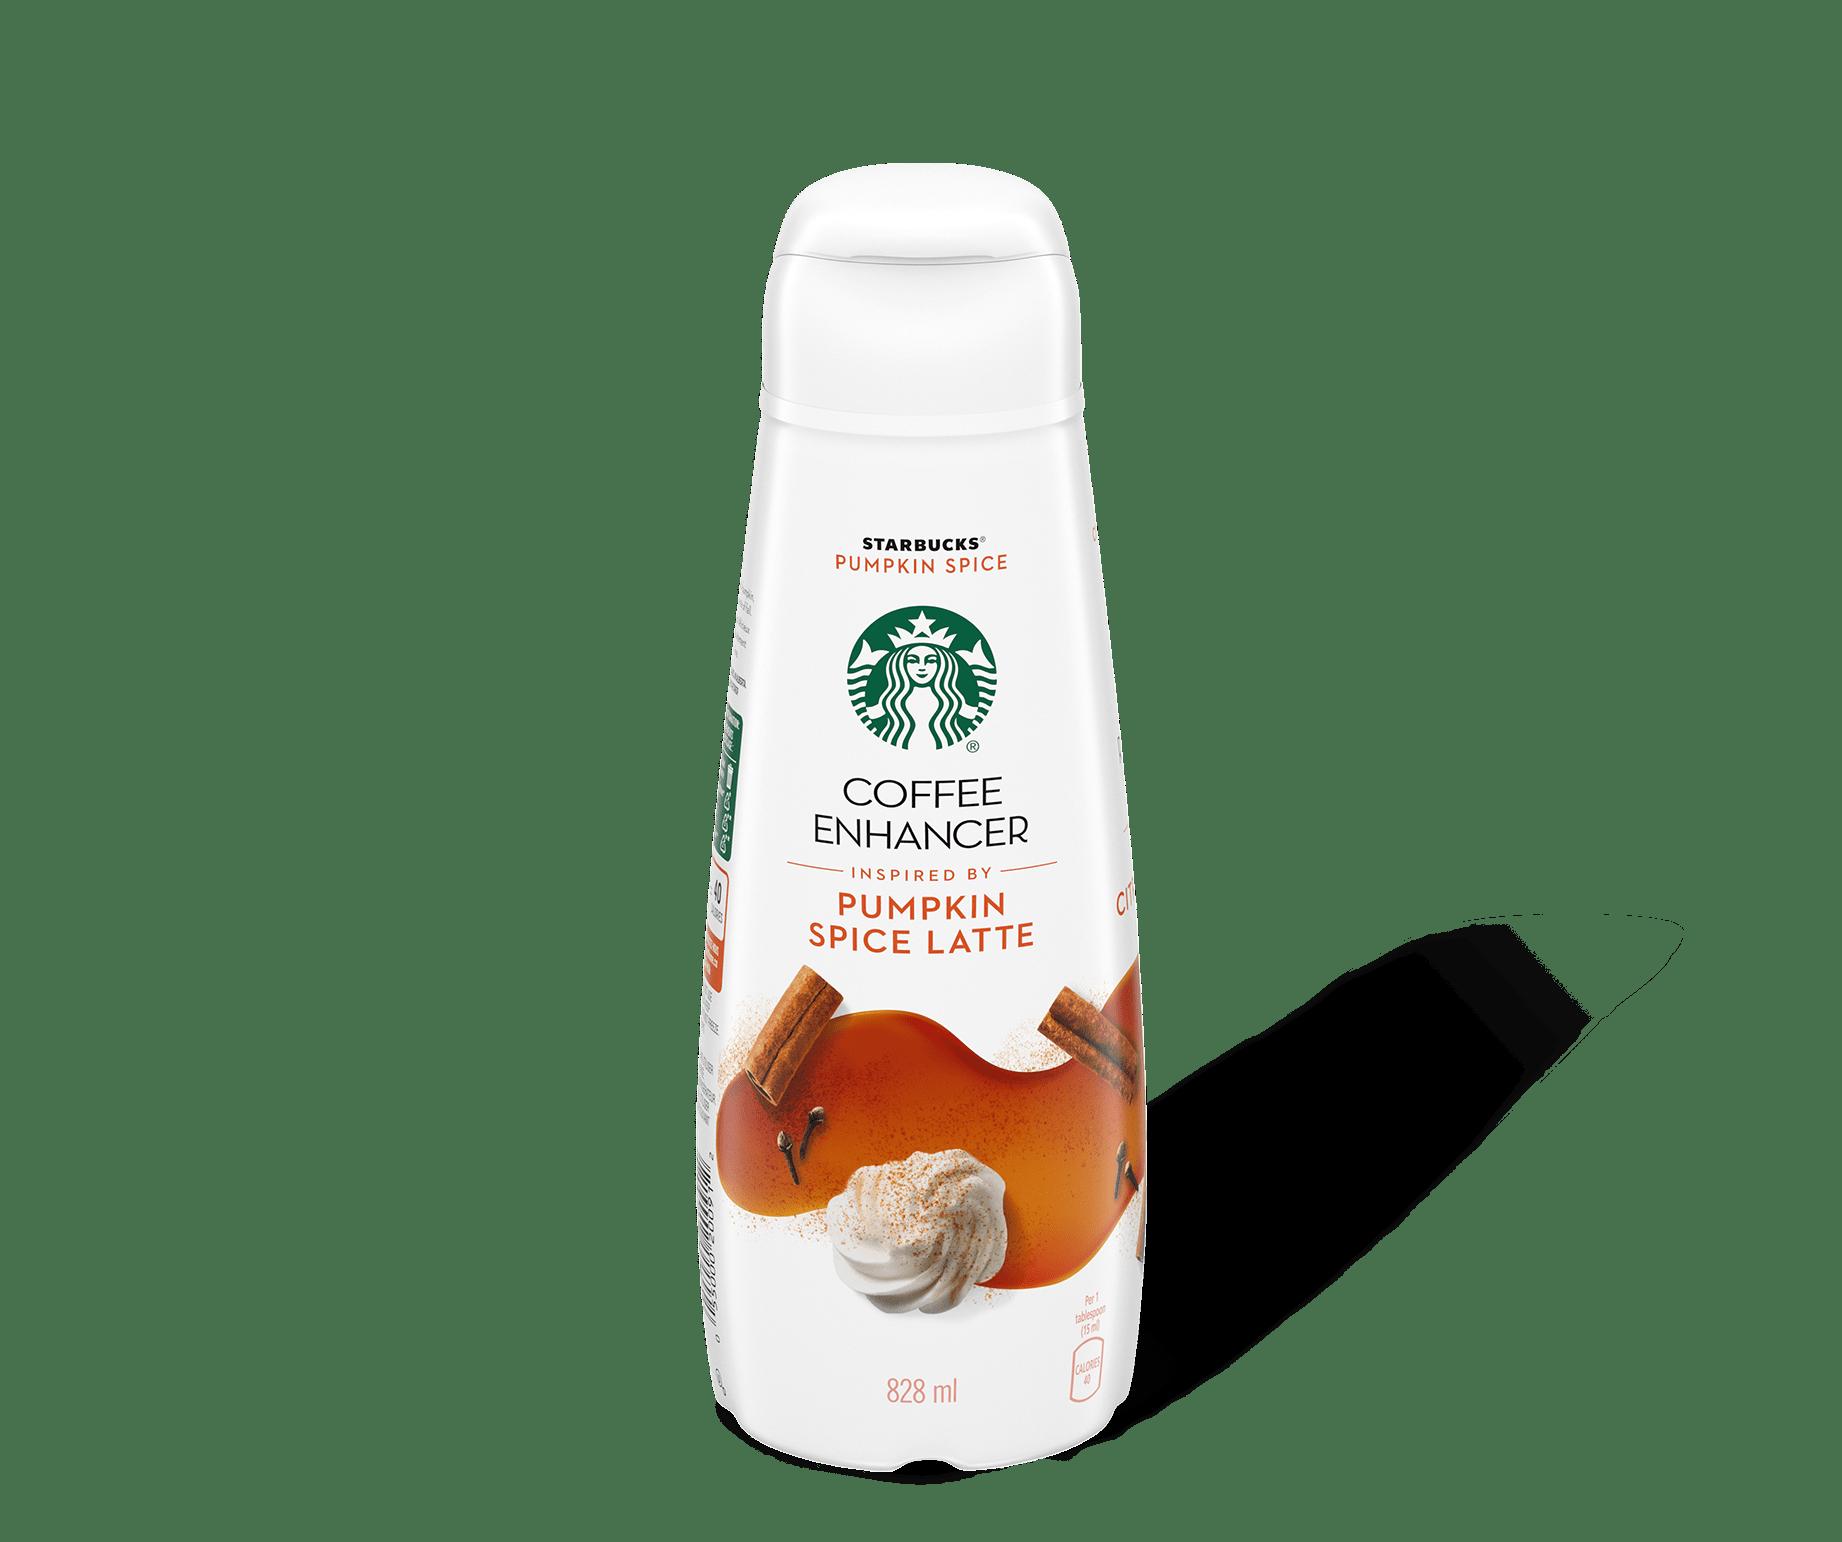 Starbucks® Pumpkin Spice Latte